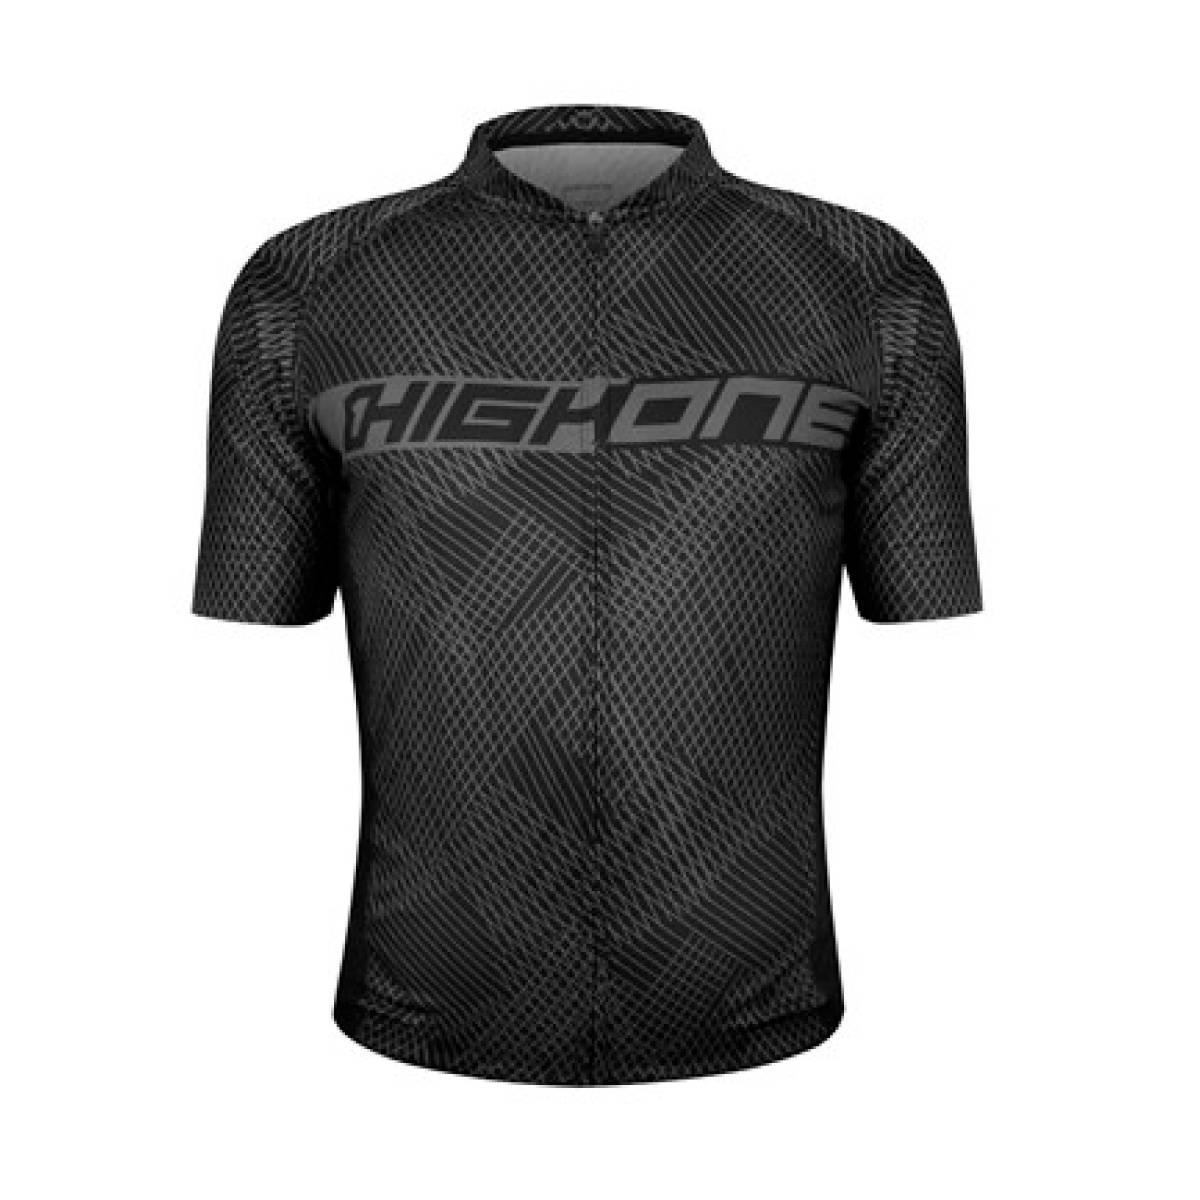 Camisa MTB High One Montano Preto